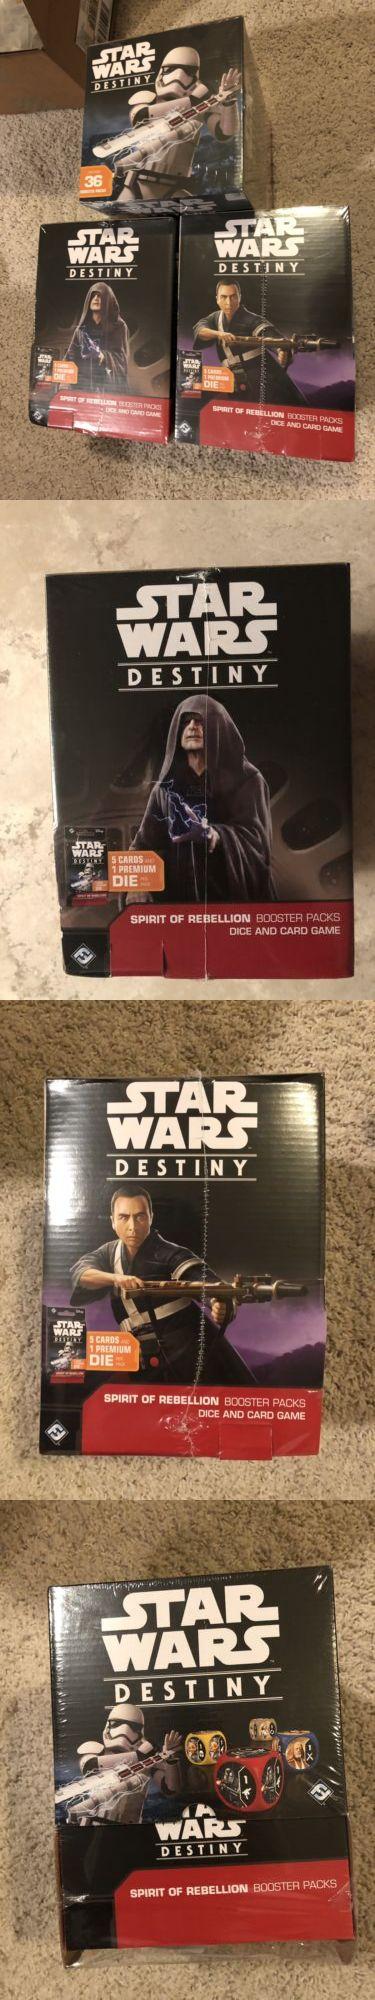 Star wars Destiny Spirit of Rebellion Booster Display New /& Sealed 36 Packs